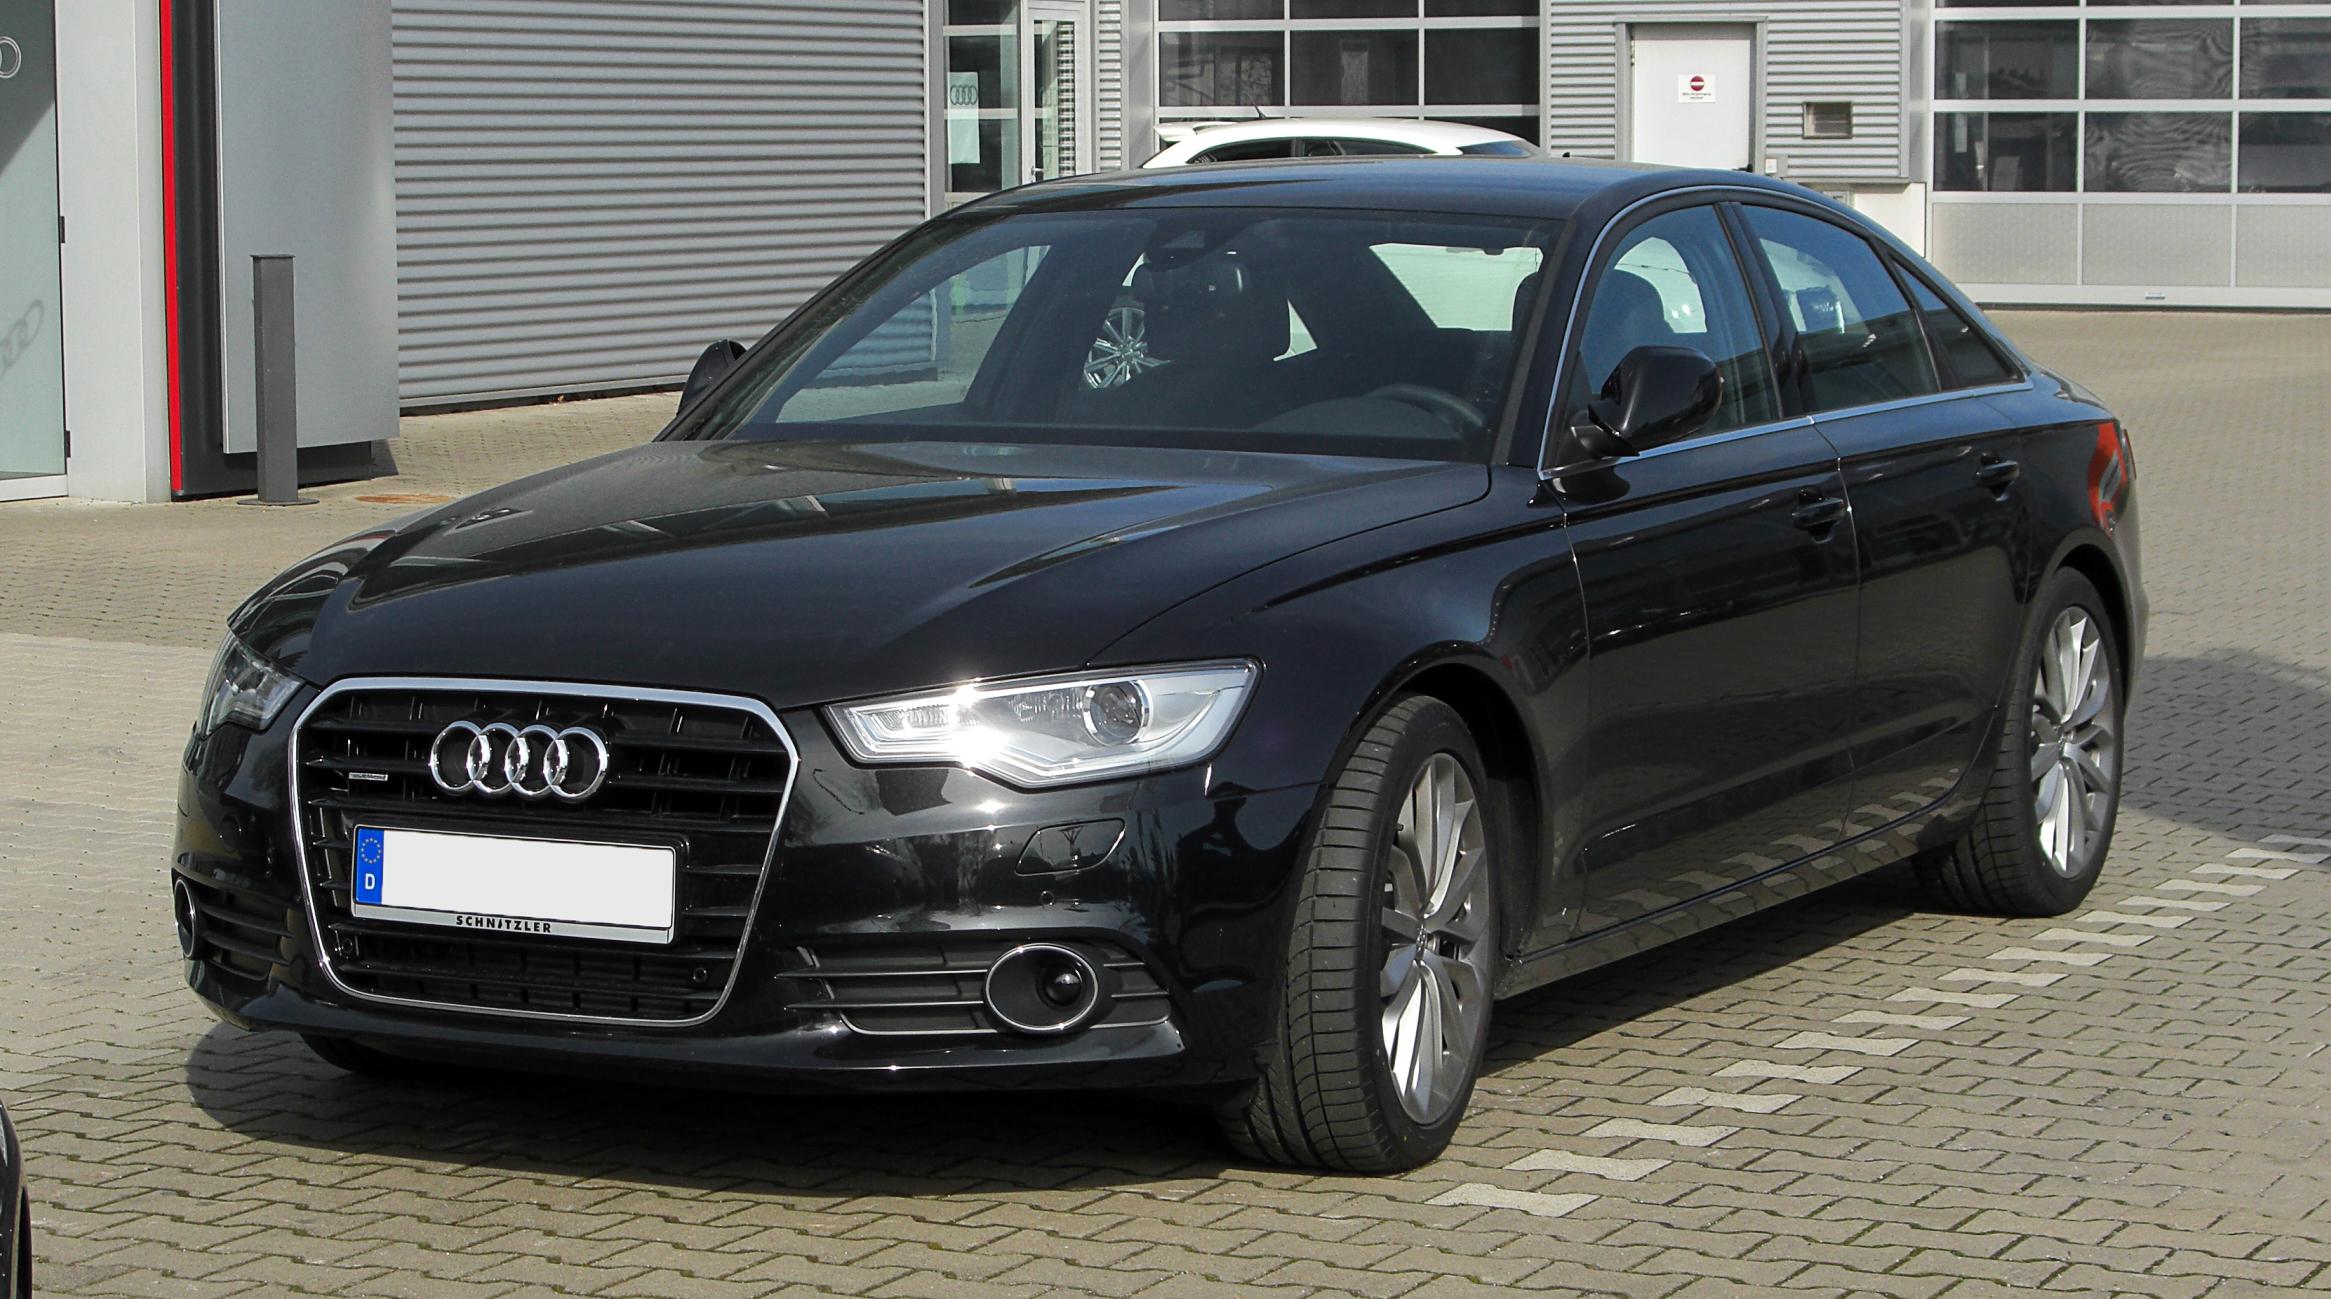 Audi tt 2008 dimensions